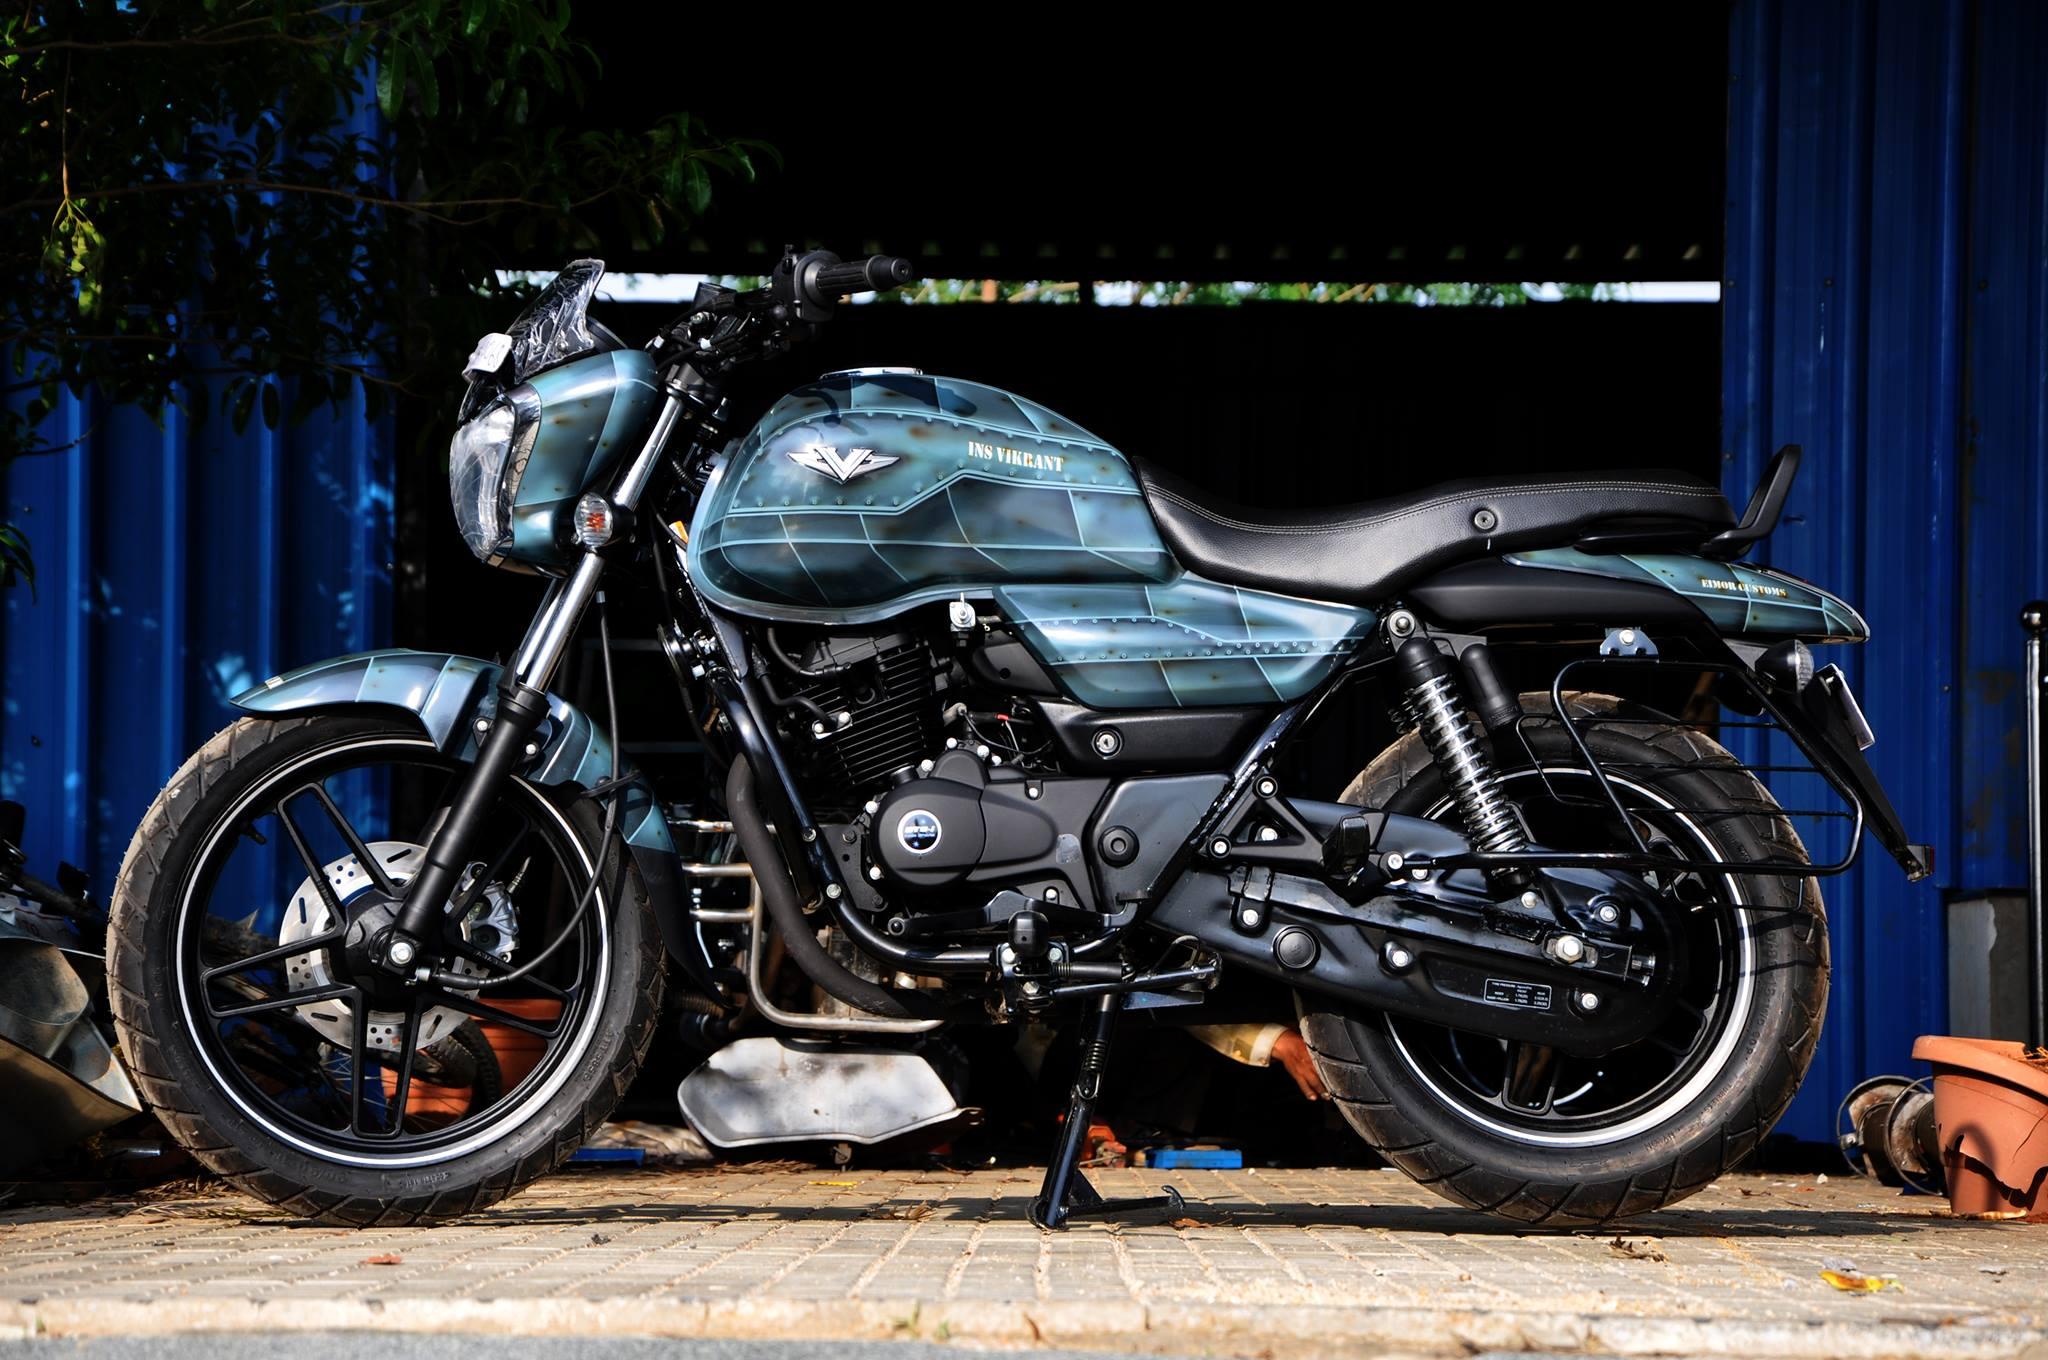 Story Behind The Modified Bajaj V15 By Eimor Customs In